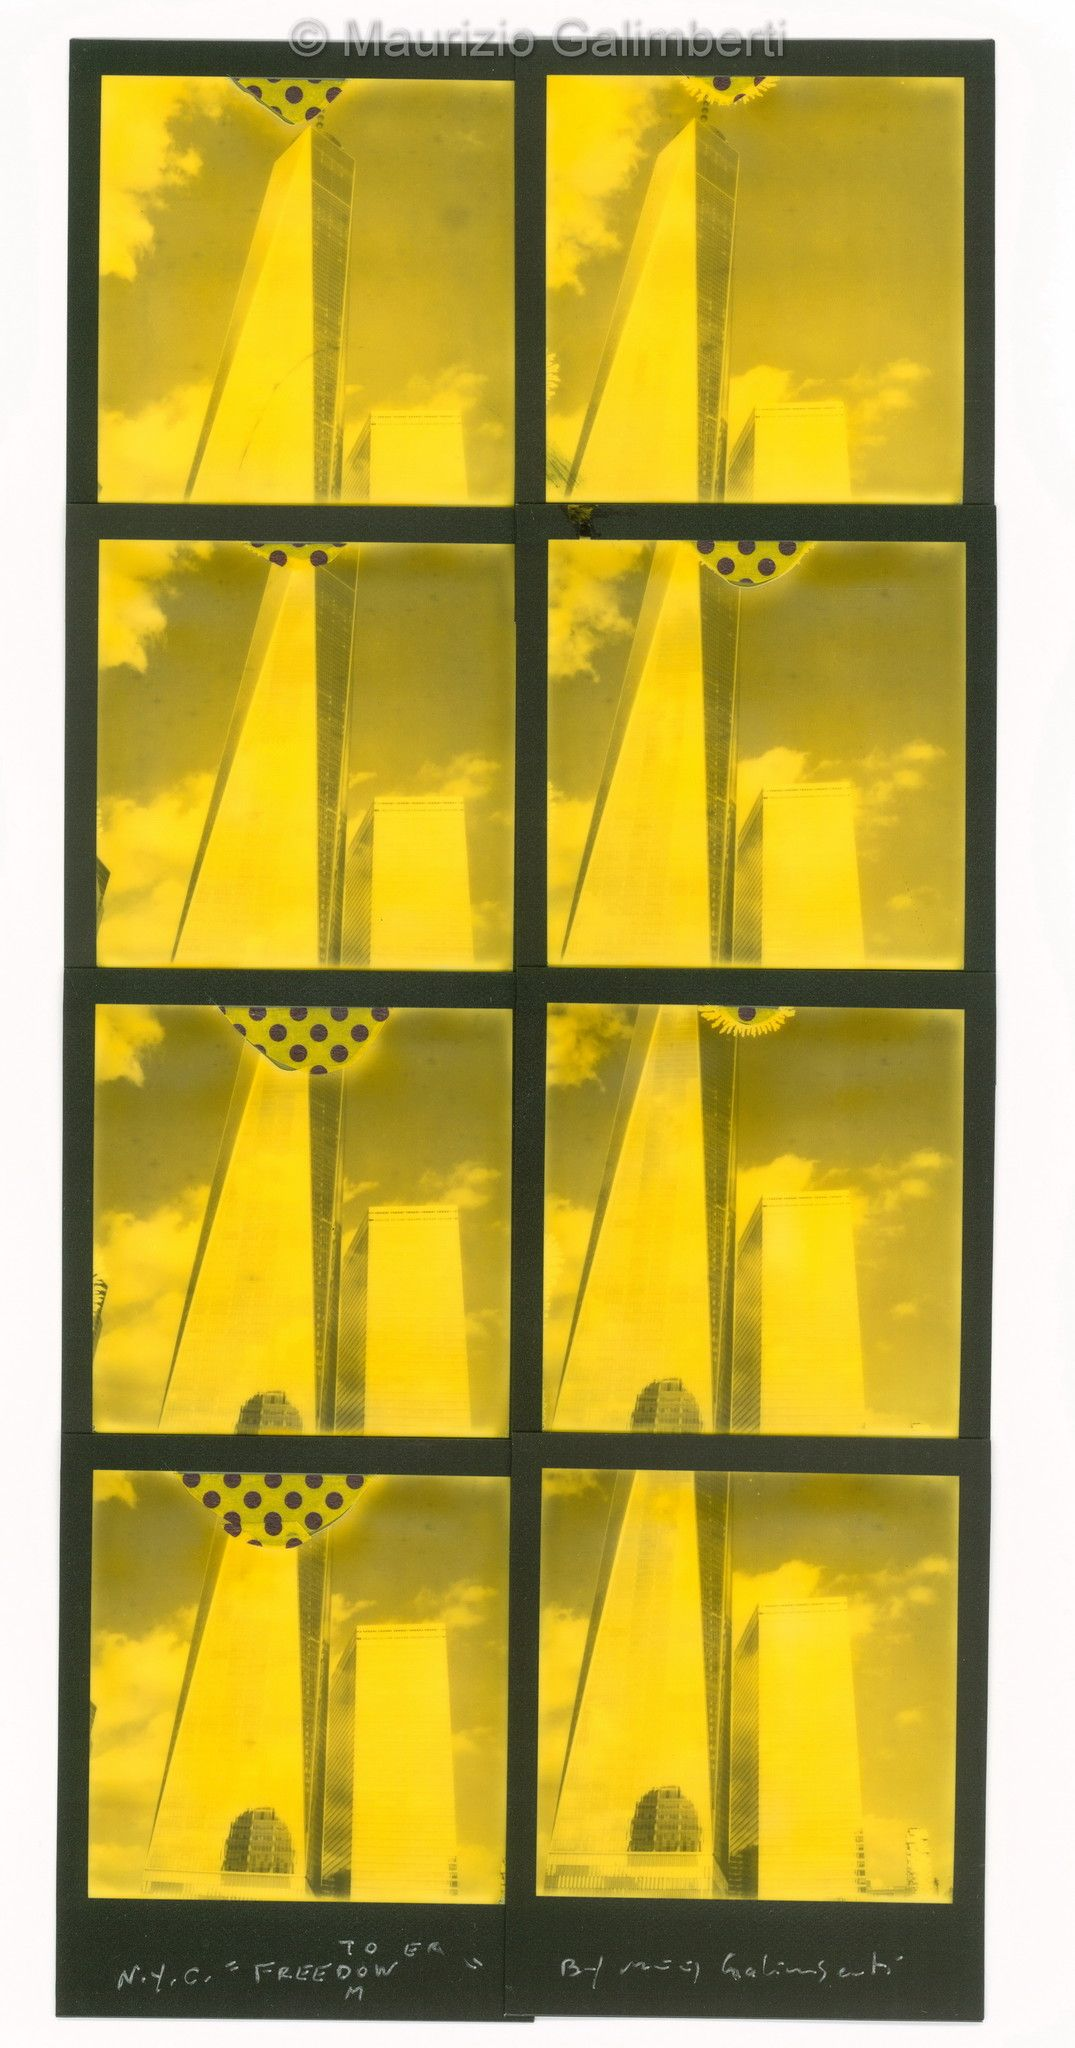 VINTAGE POLAROID MAURIZIO GALIMBERTI 'FREEDOM' dimensioni cm. 40x60